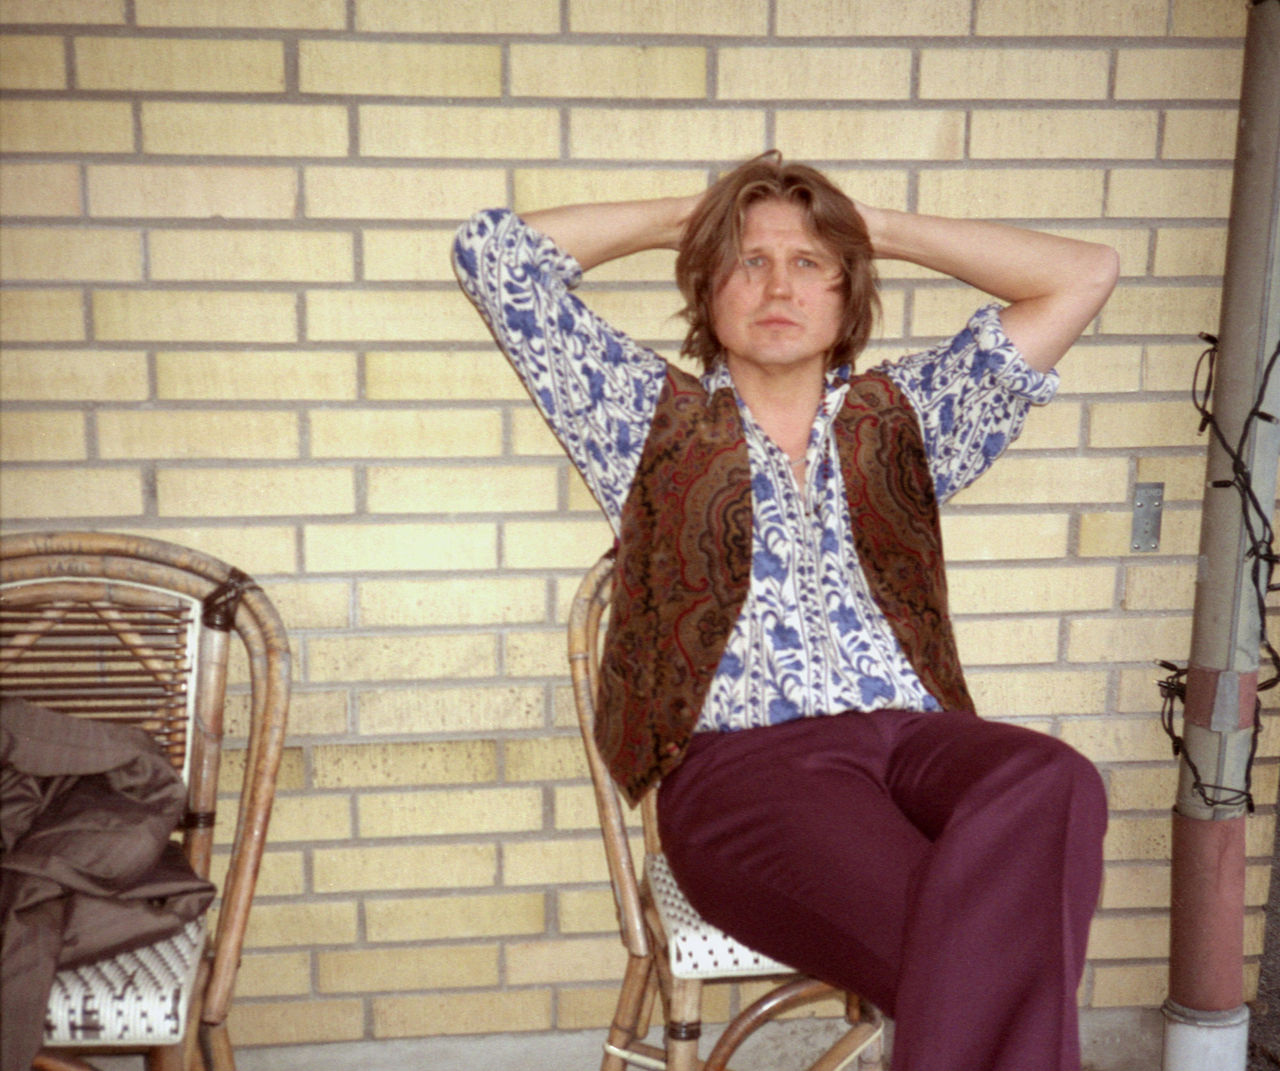 Krunegård släpper årets andra album